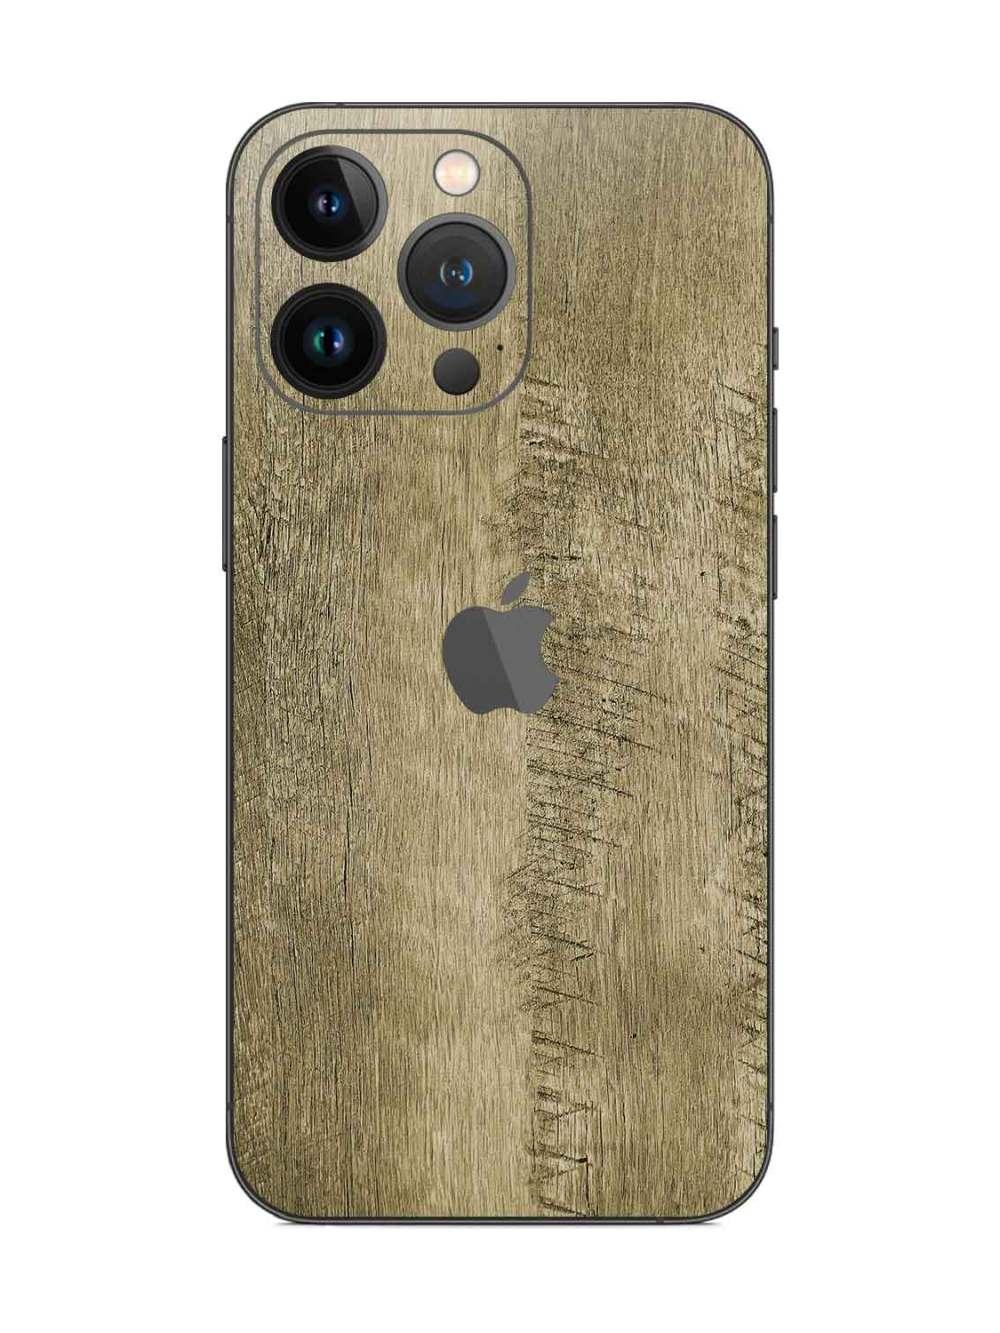 iPhone 13 Pro Max skin wrap skins uk